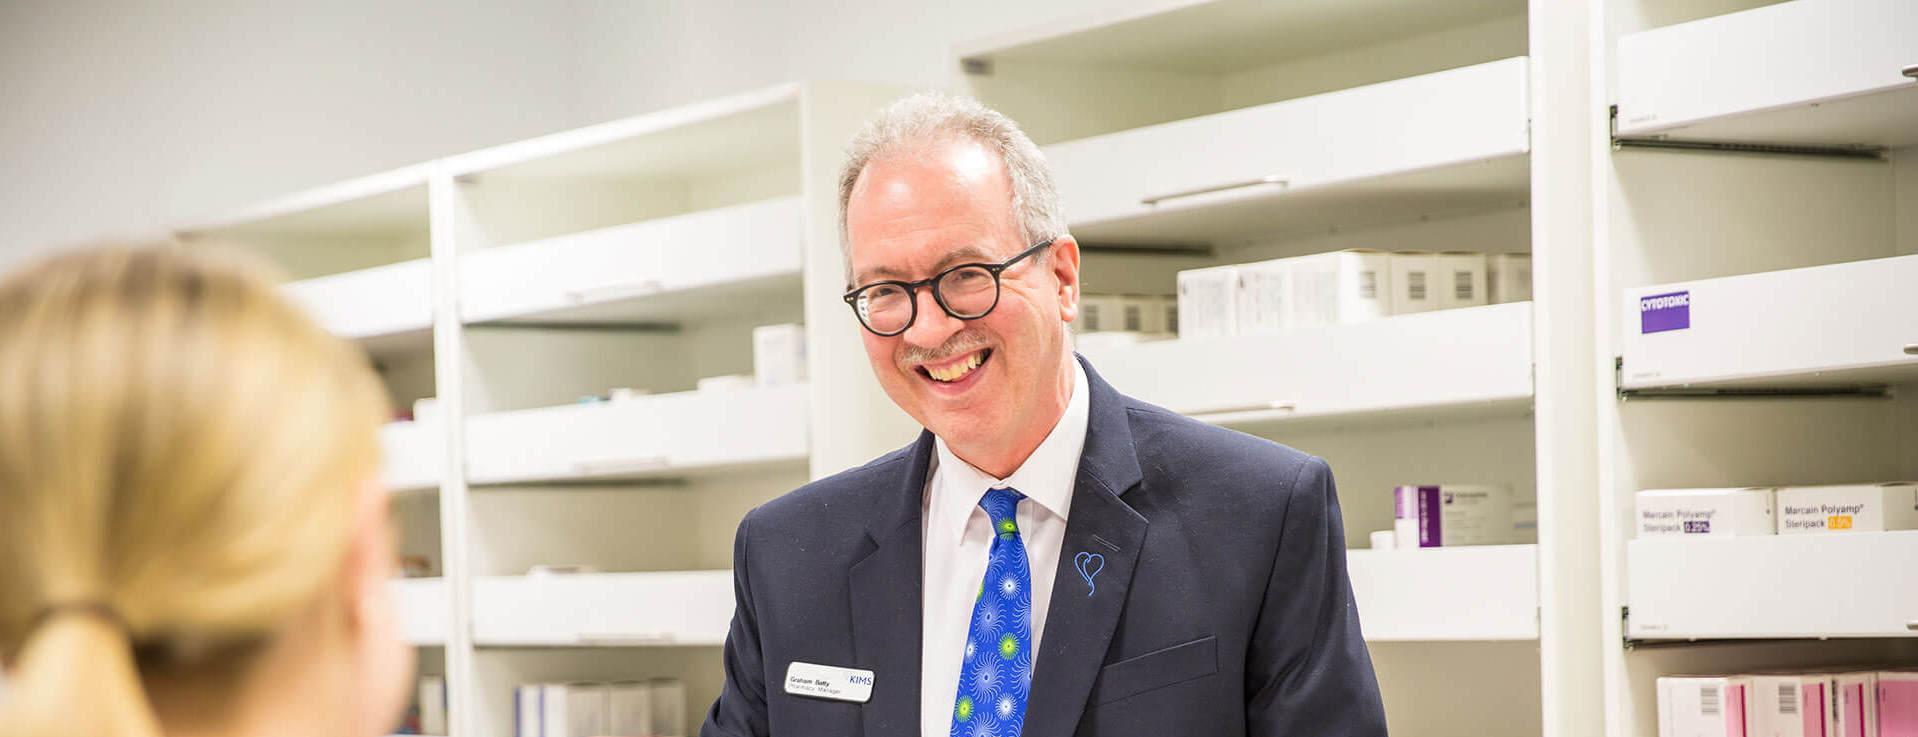 Graham pharmacy manager in the KIMS Hospital pharmacy